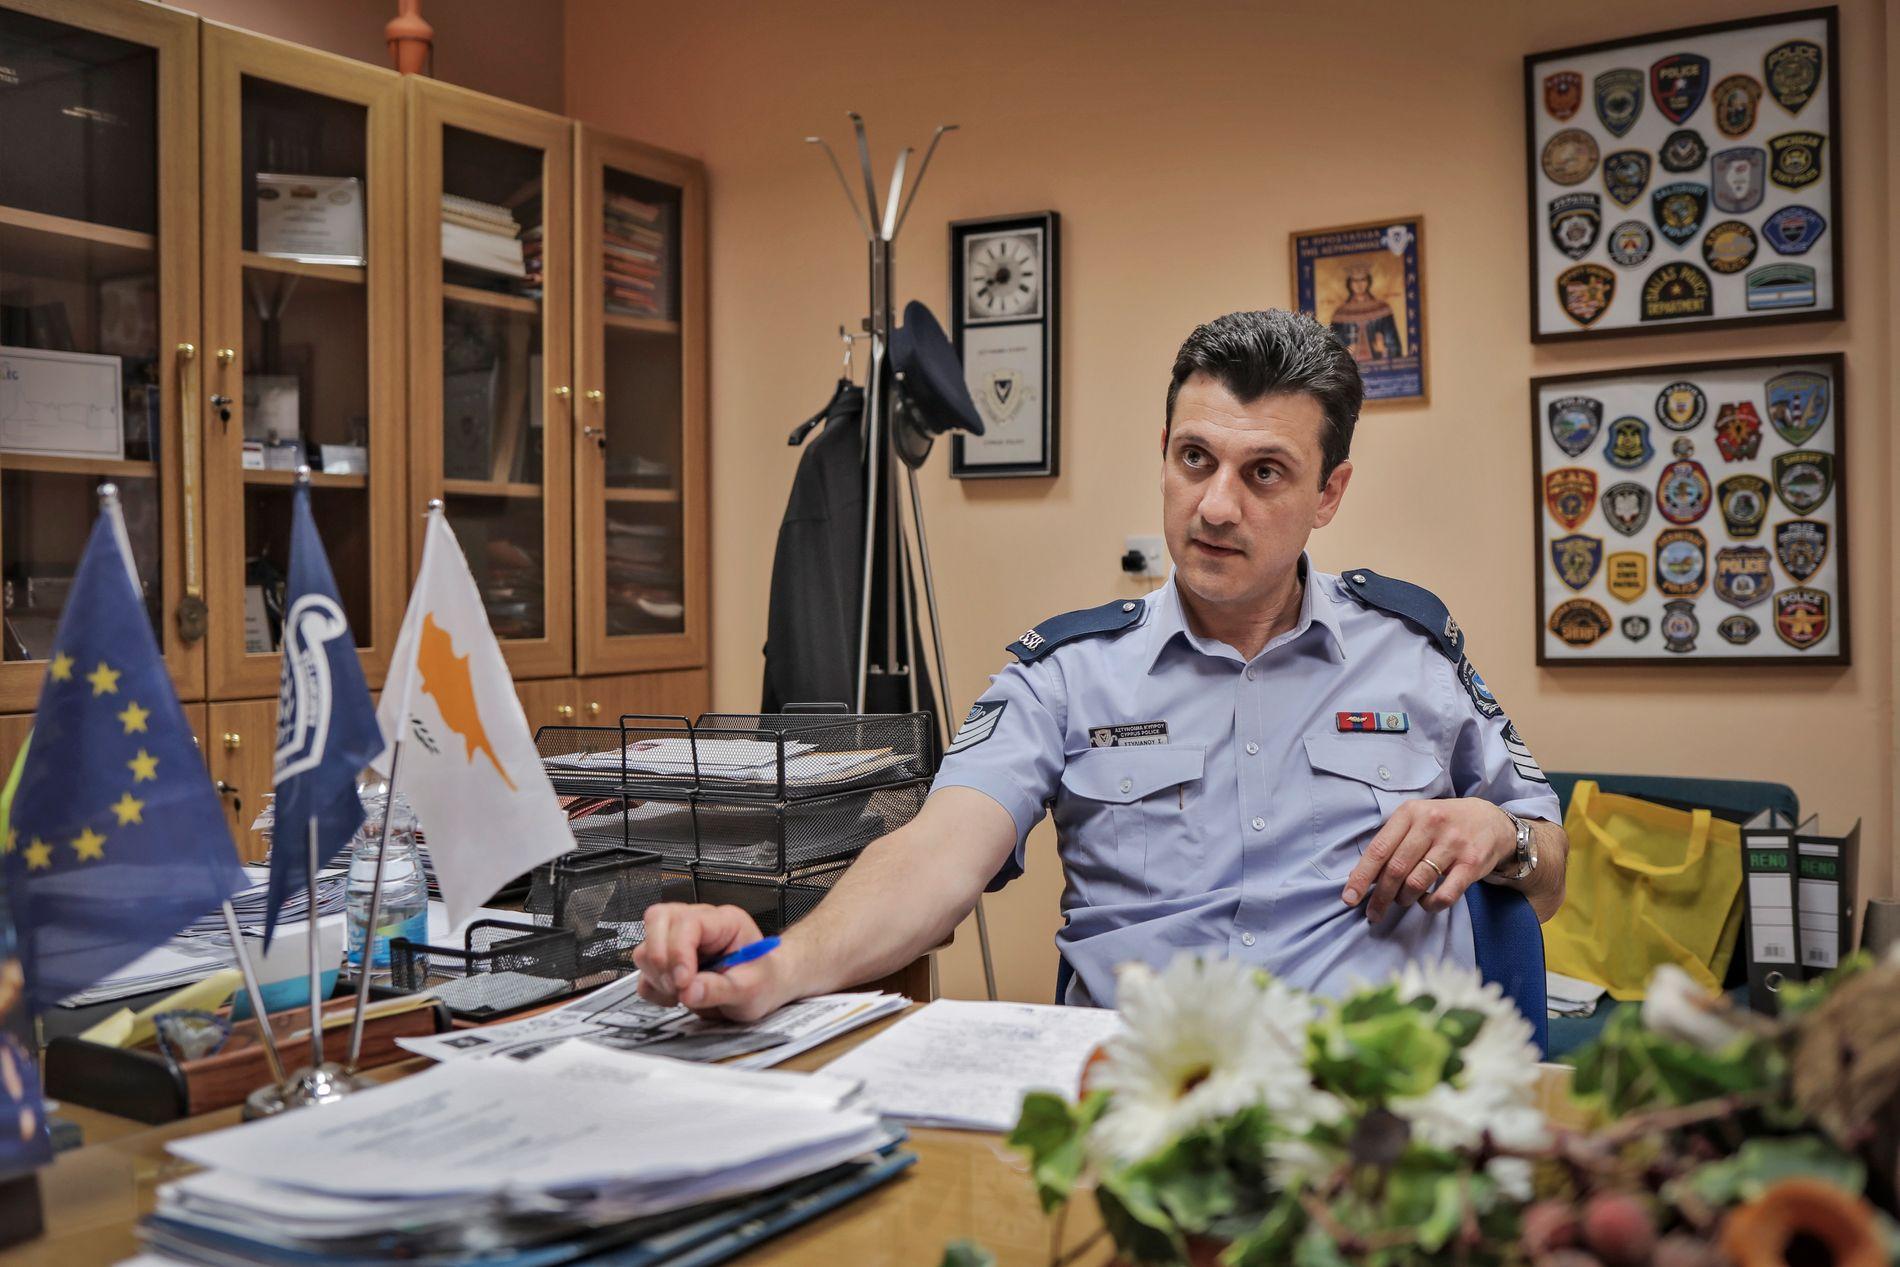 ETTERFORSKER: Pressetalsmann Stelios Stylianon i politiet på Kypros.